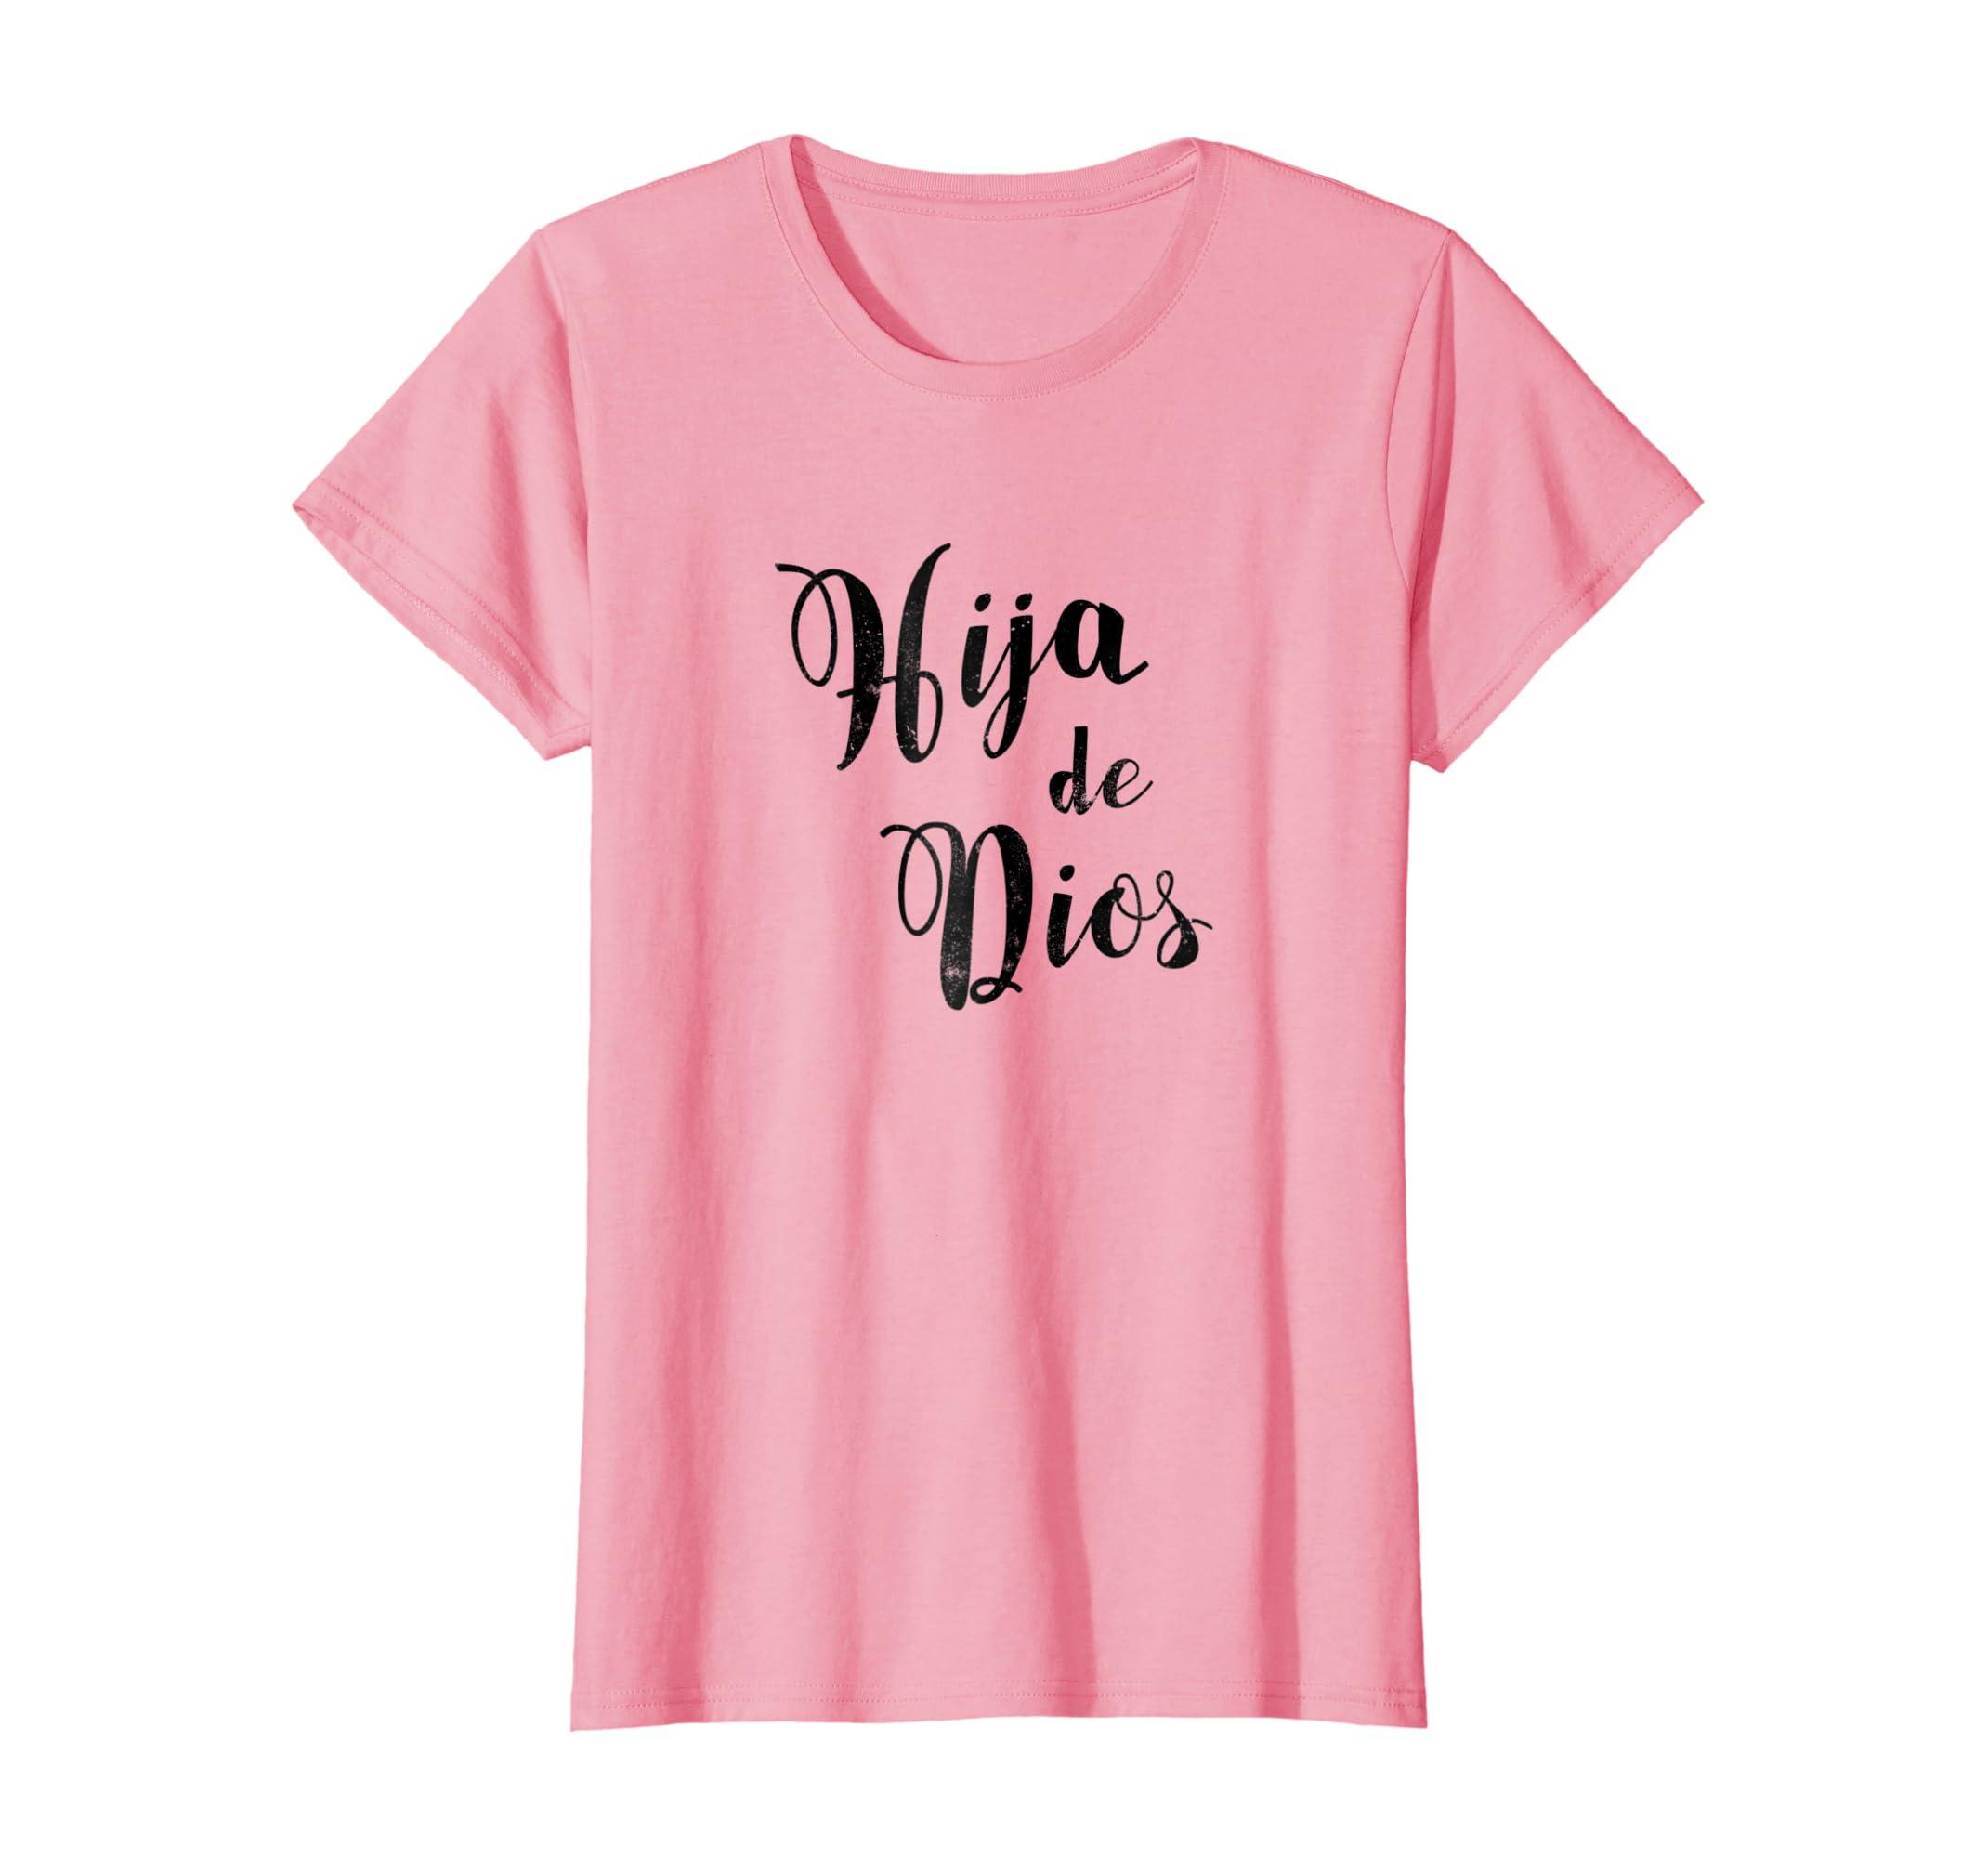 Amazon.com: Camisas Espanolas religiosas, camiseta de la hija de dios: Clothing